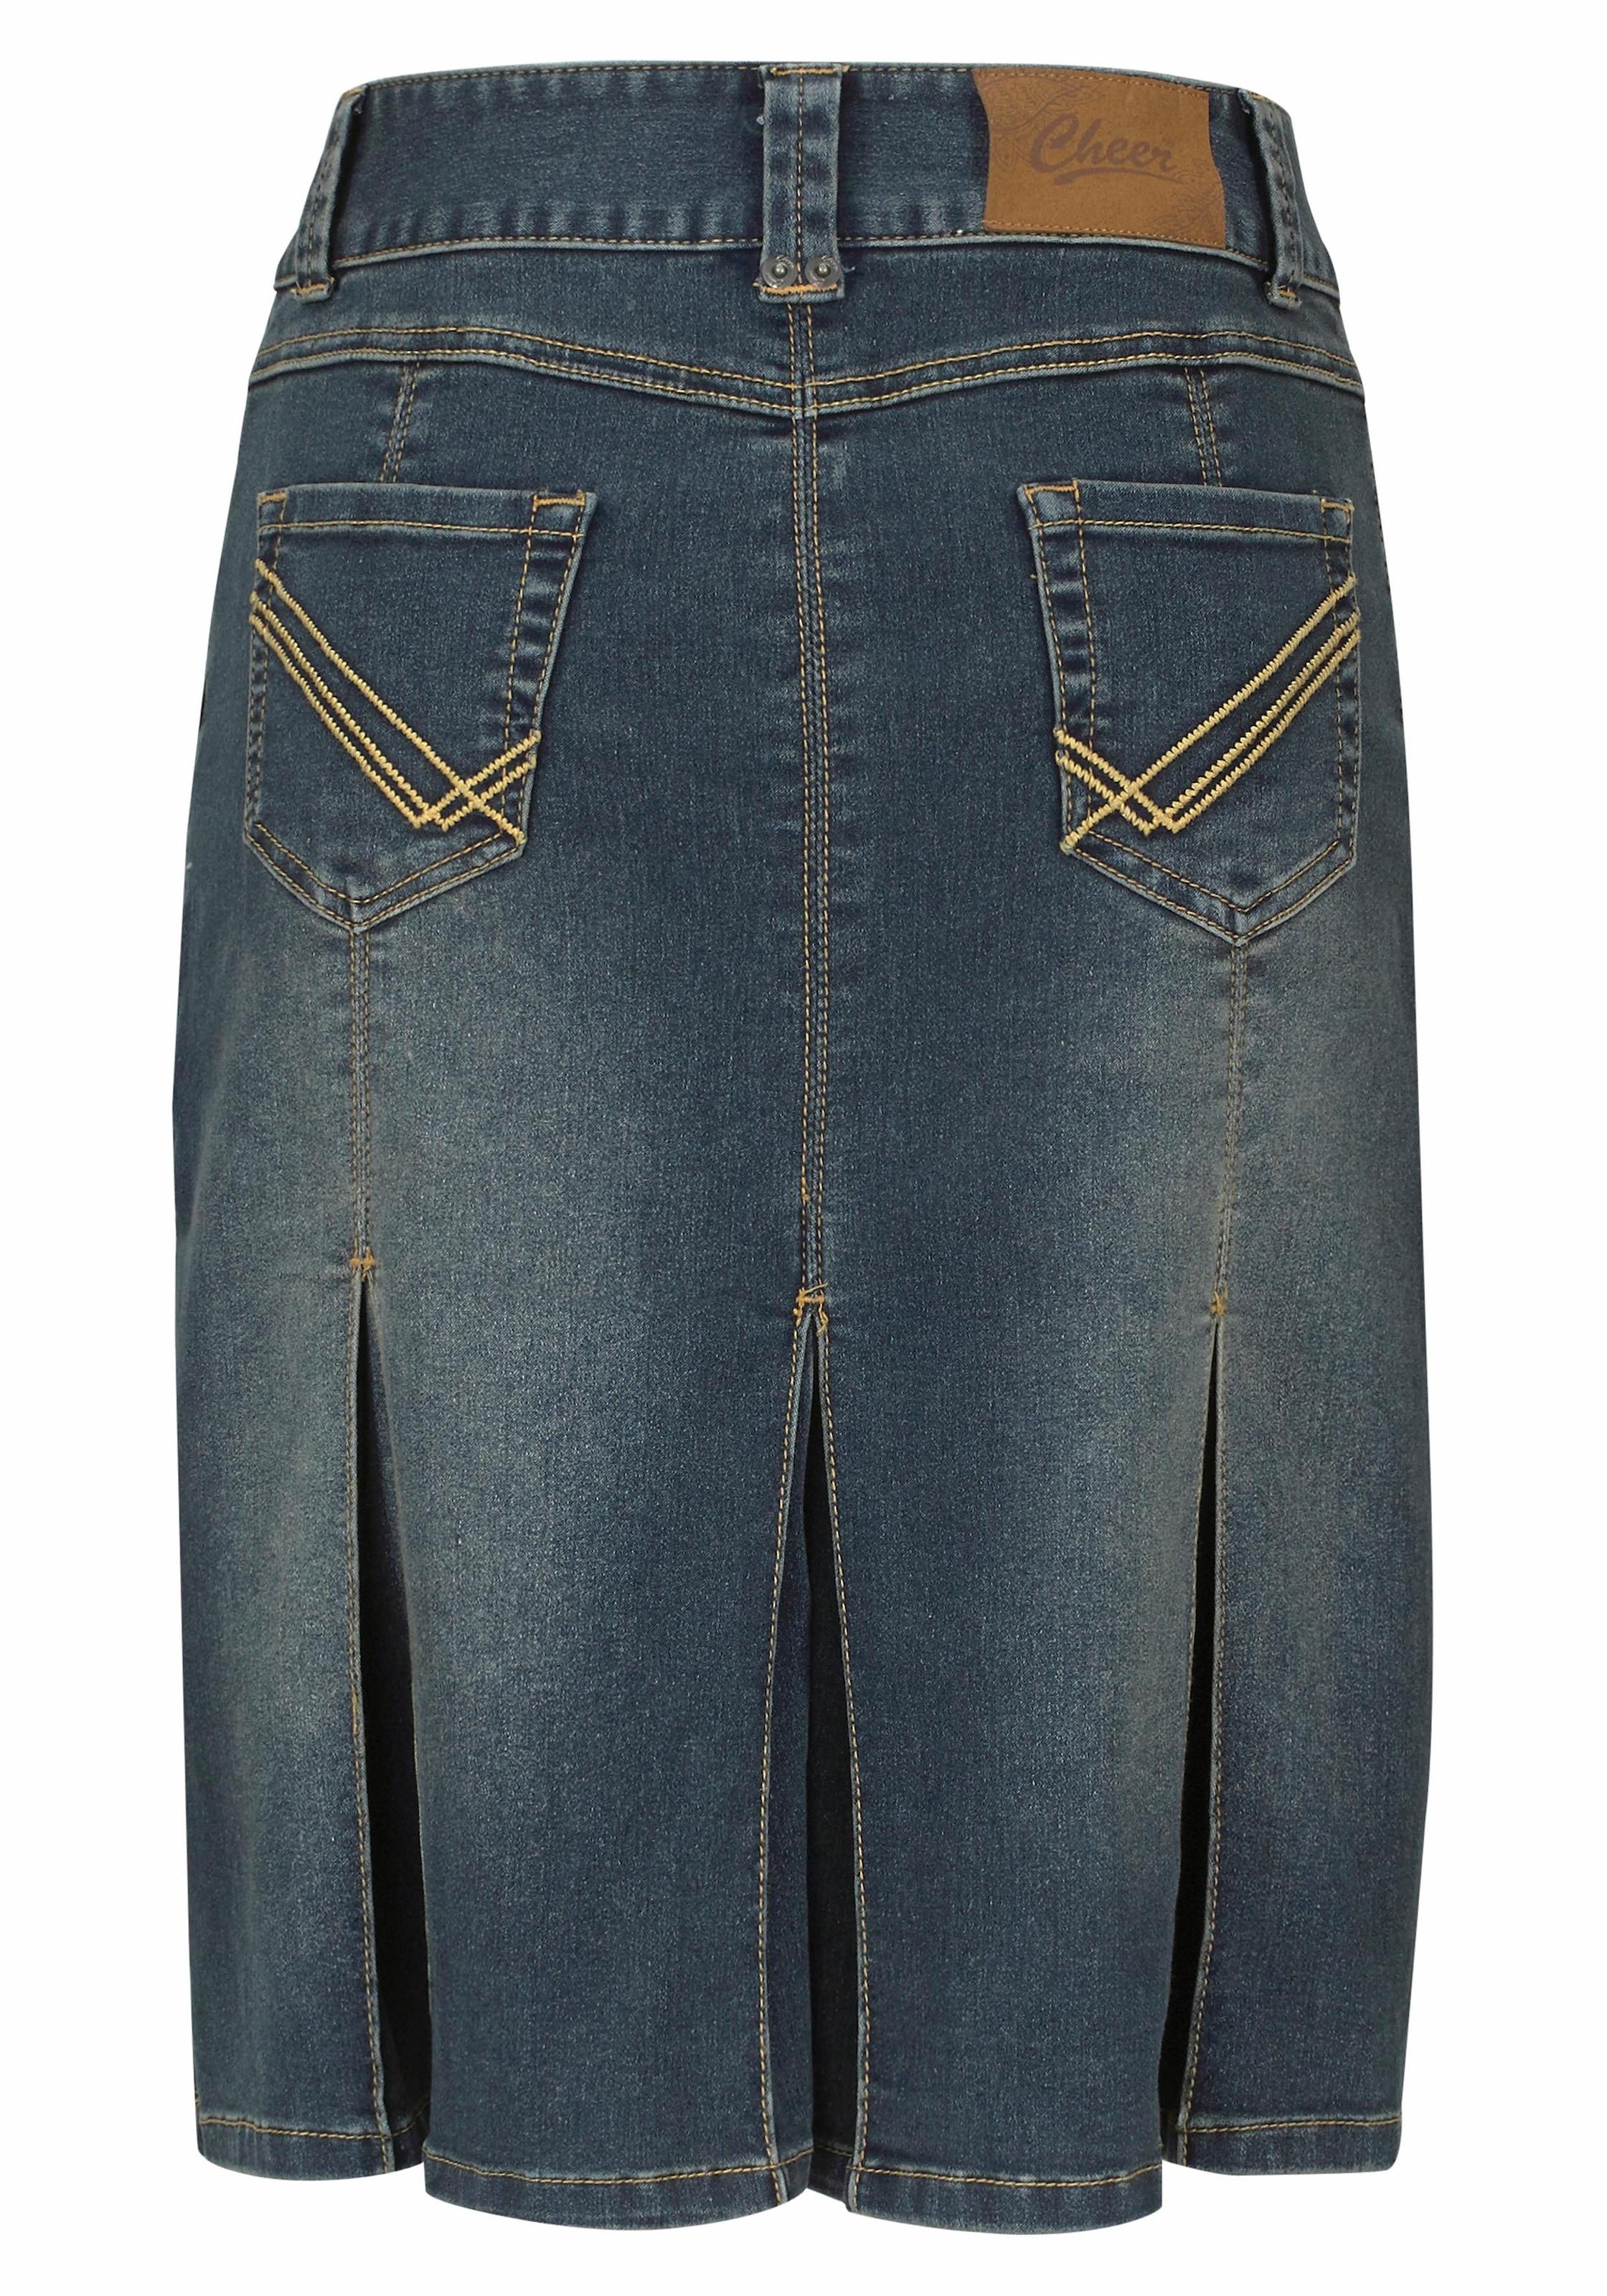 aniston casual jeansrock Damen Jeansrock in trendiger Used Waschung AKLBB491126484